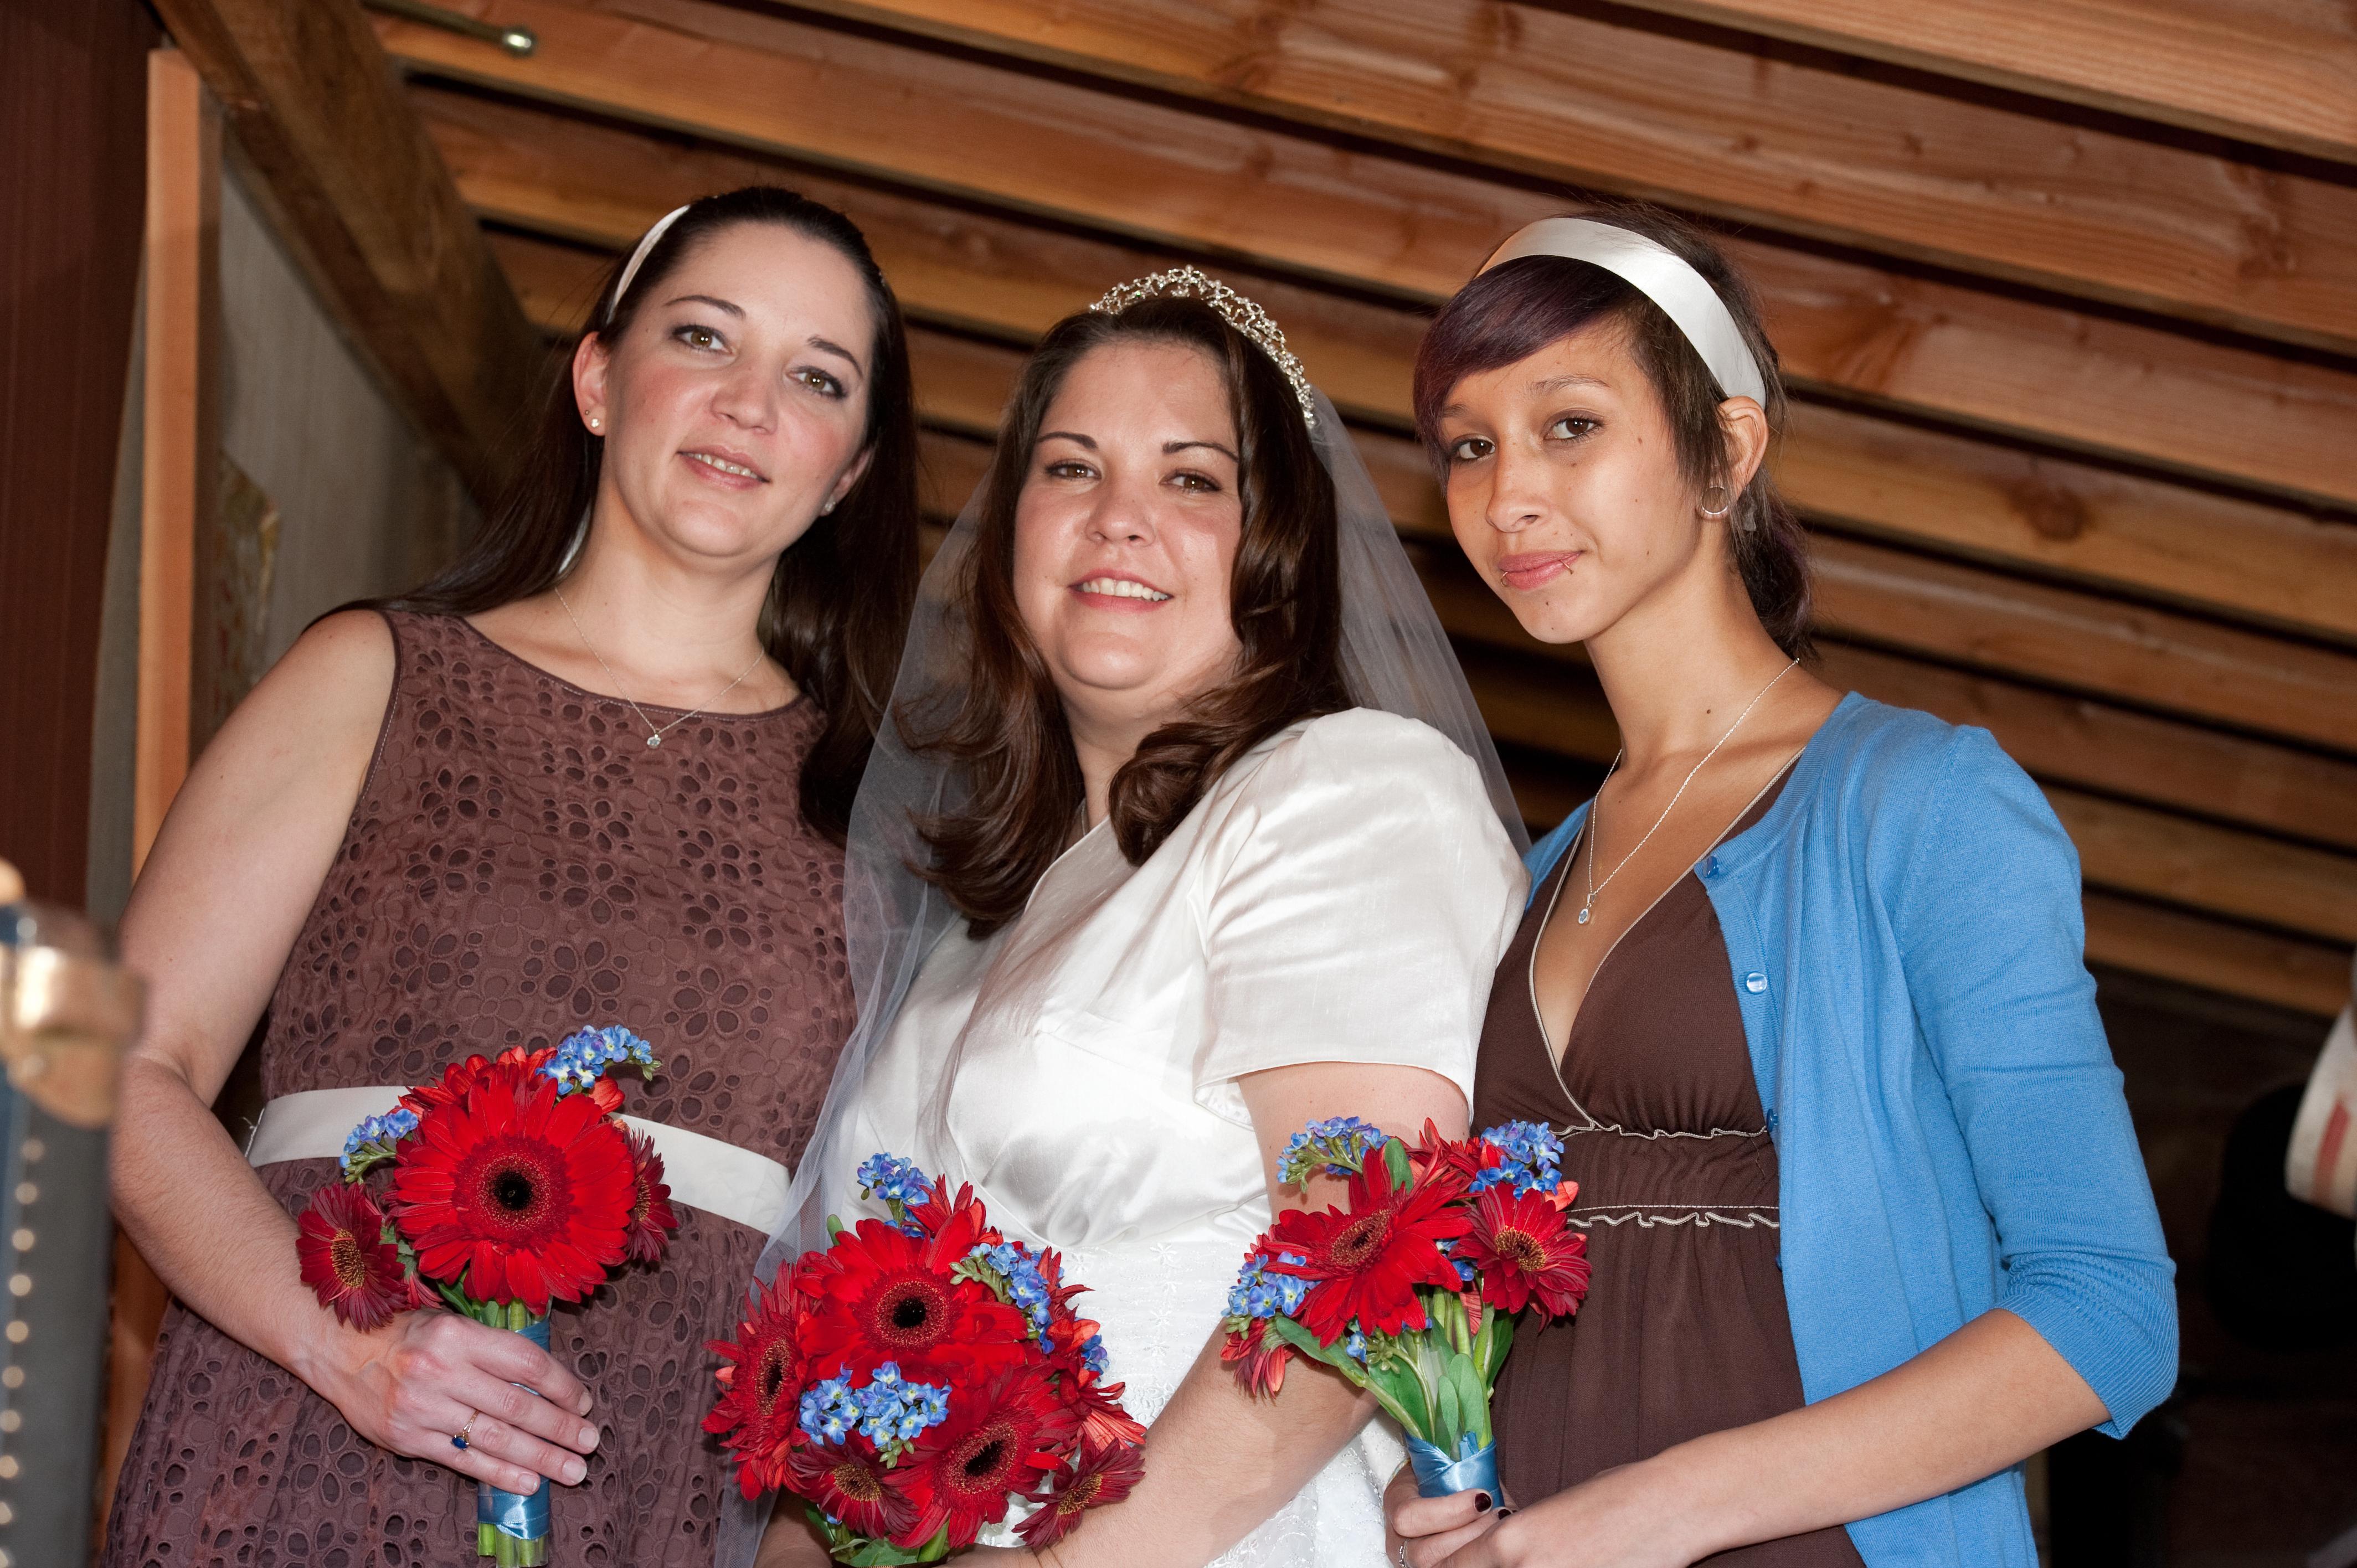 Flowers & Decor, Bridesmaids, Bridesmaids Dresses, Wedding Dresses, Fashion, dress, Bridesmaid Bouquets, Flowers, Flower Wedding Dresses